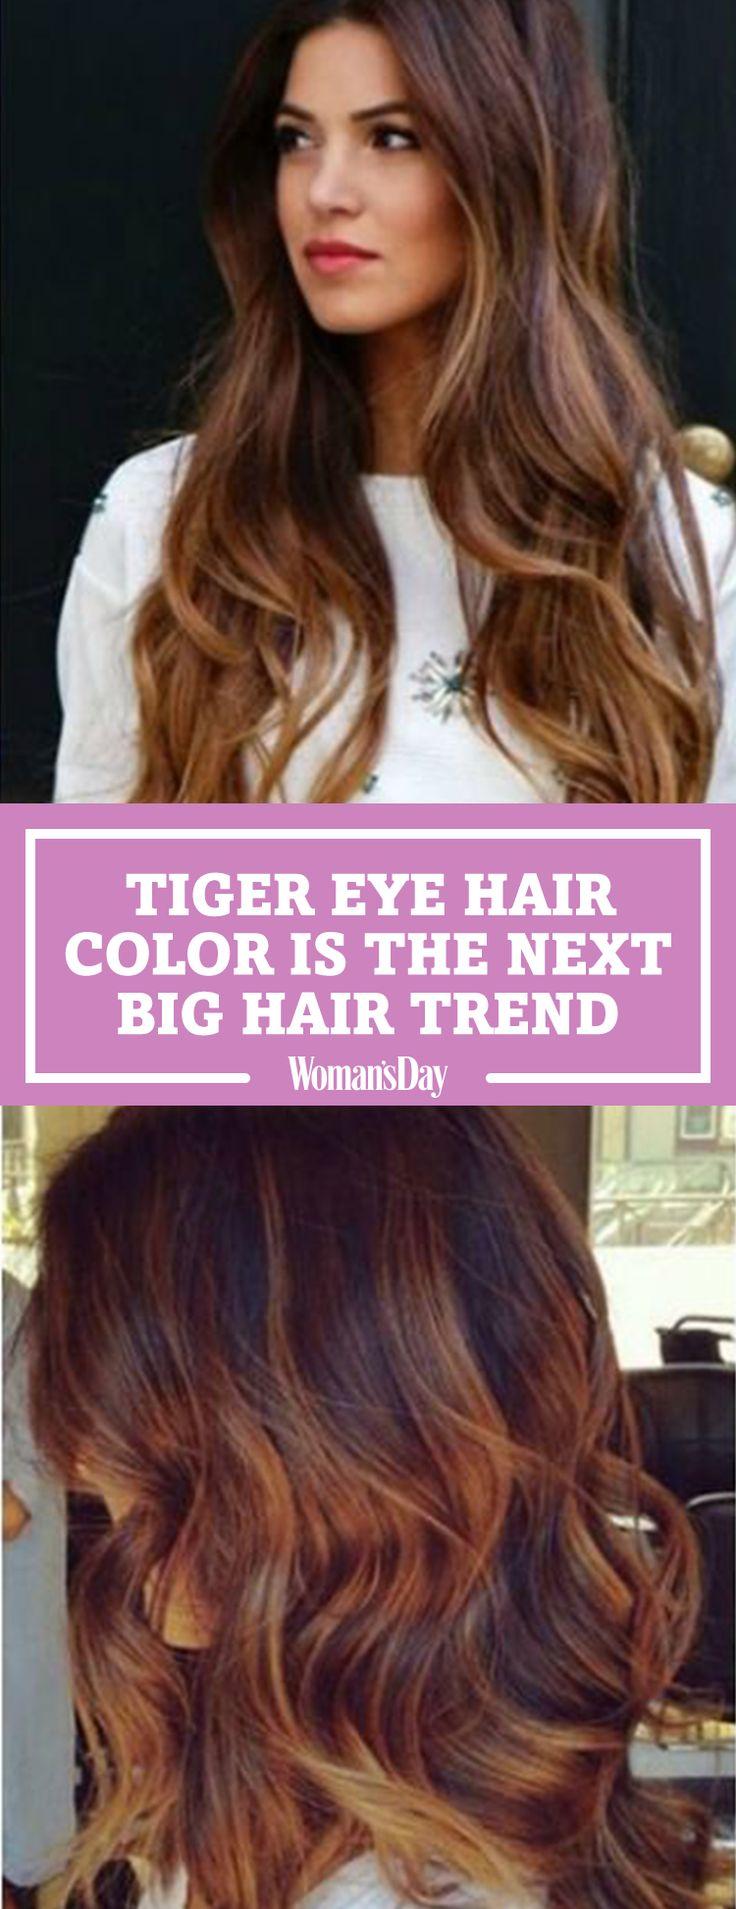 best mechas tiger eye images on pinterest hair ideas tiger eye